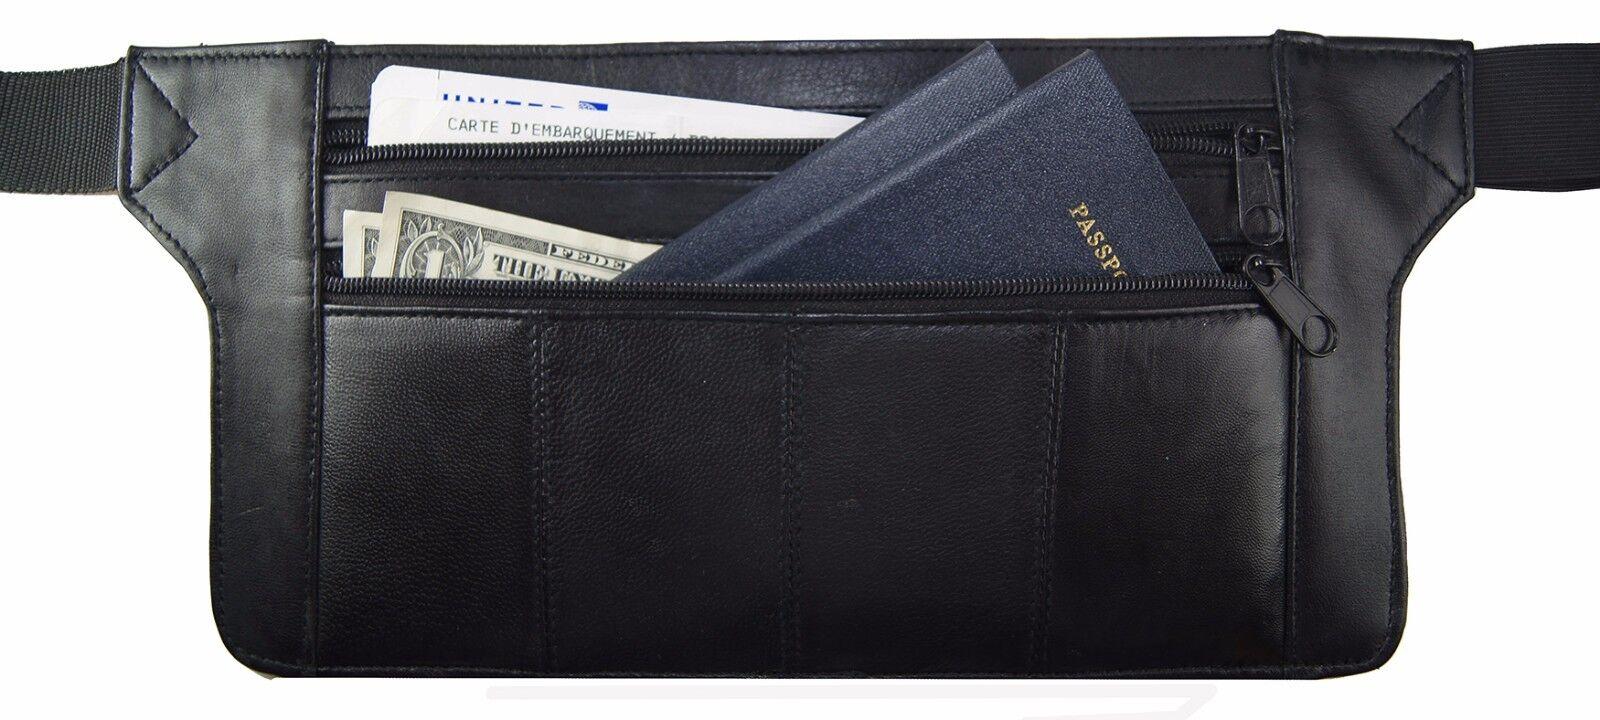 Genuine Real Leather Travel Organizer Bum Bag Hide Money Wai